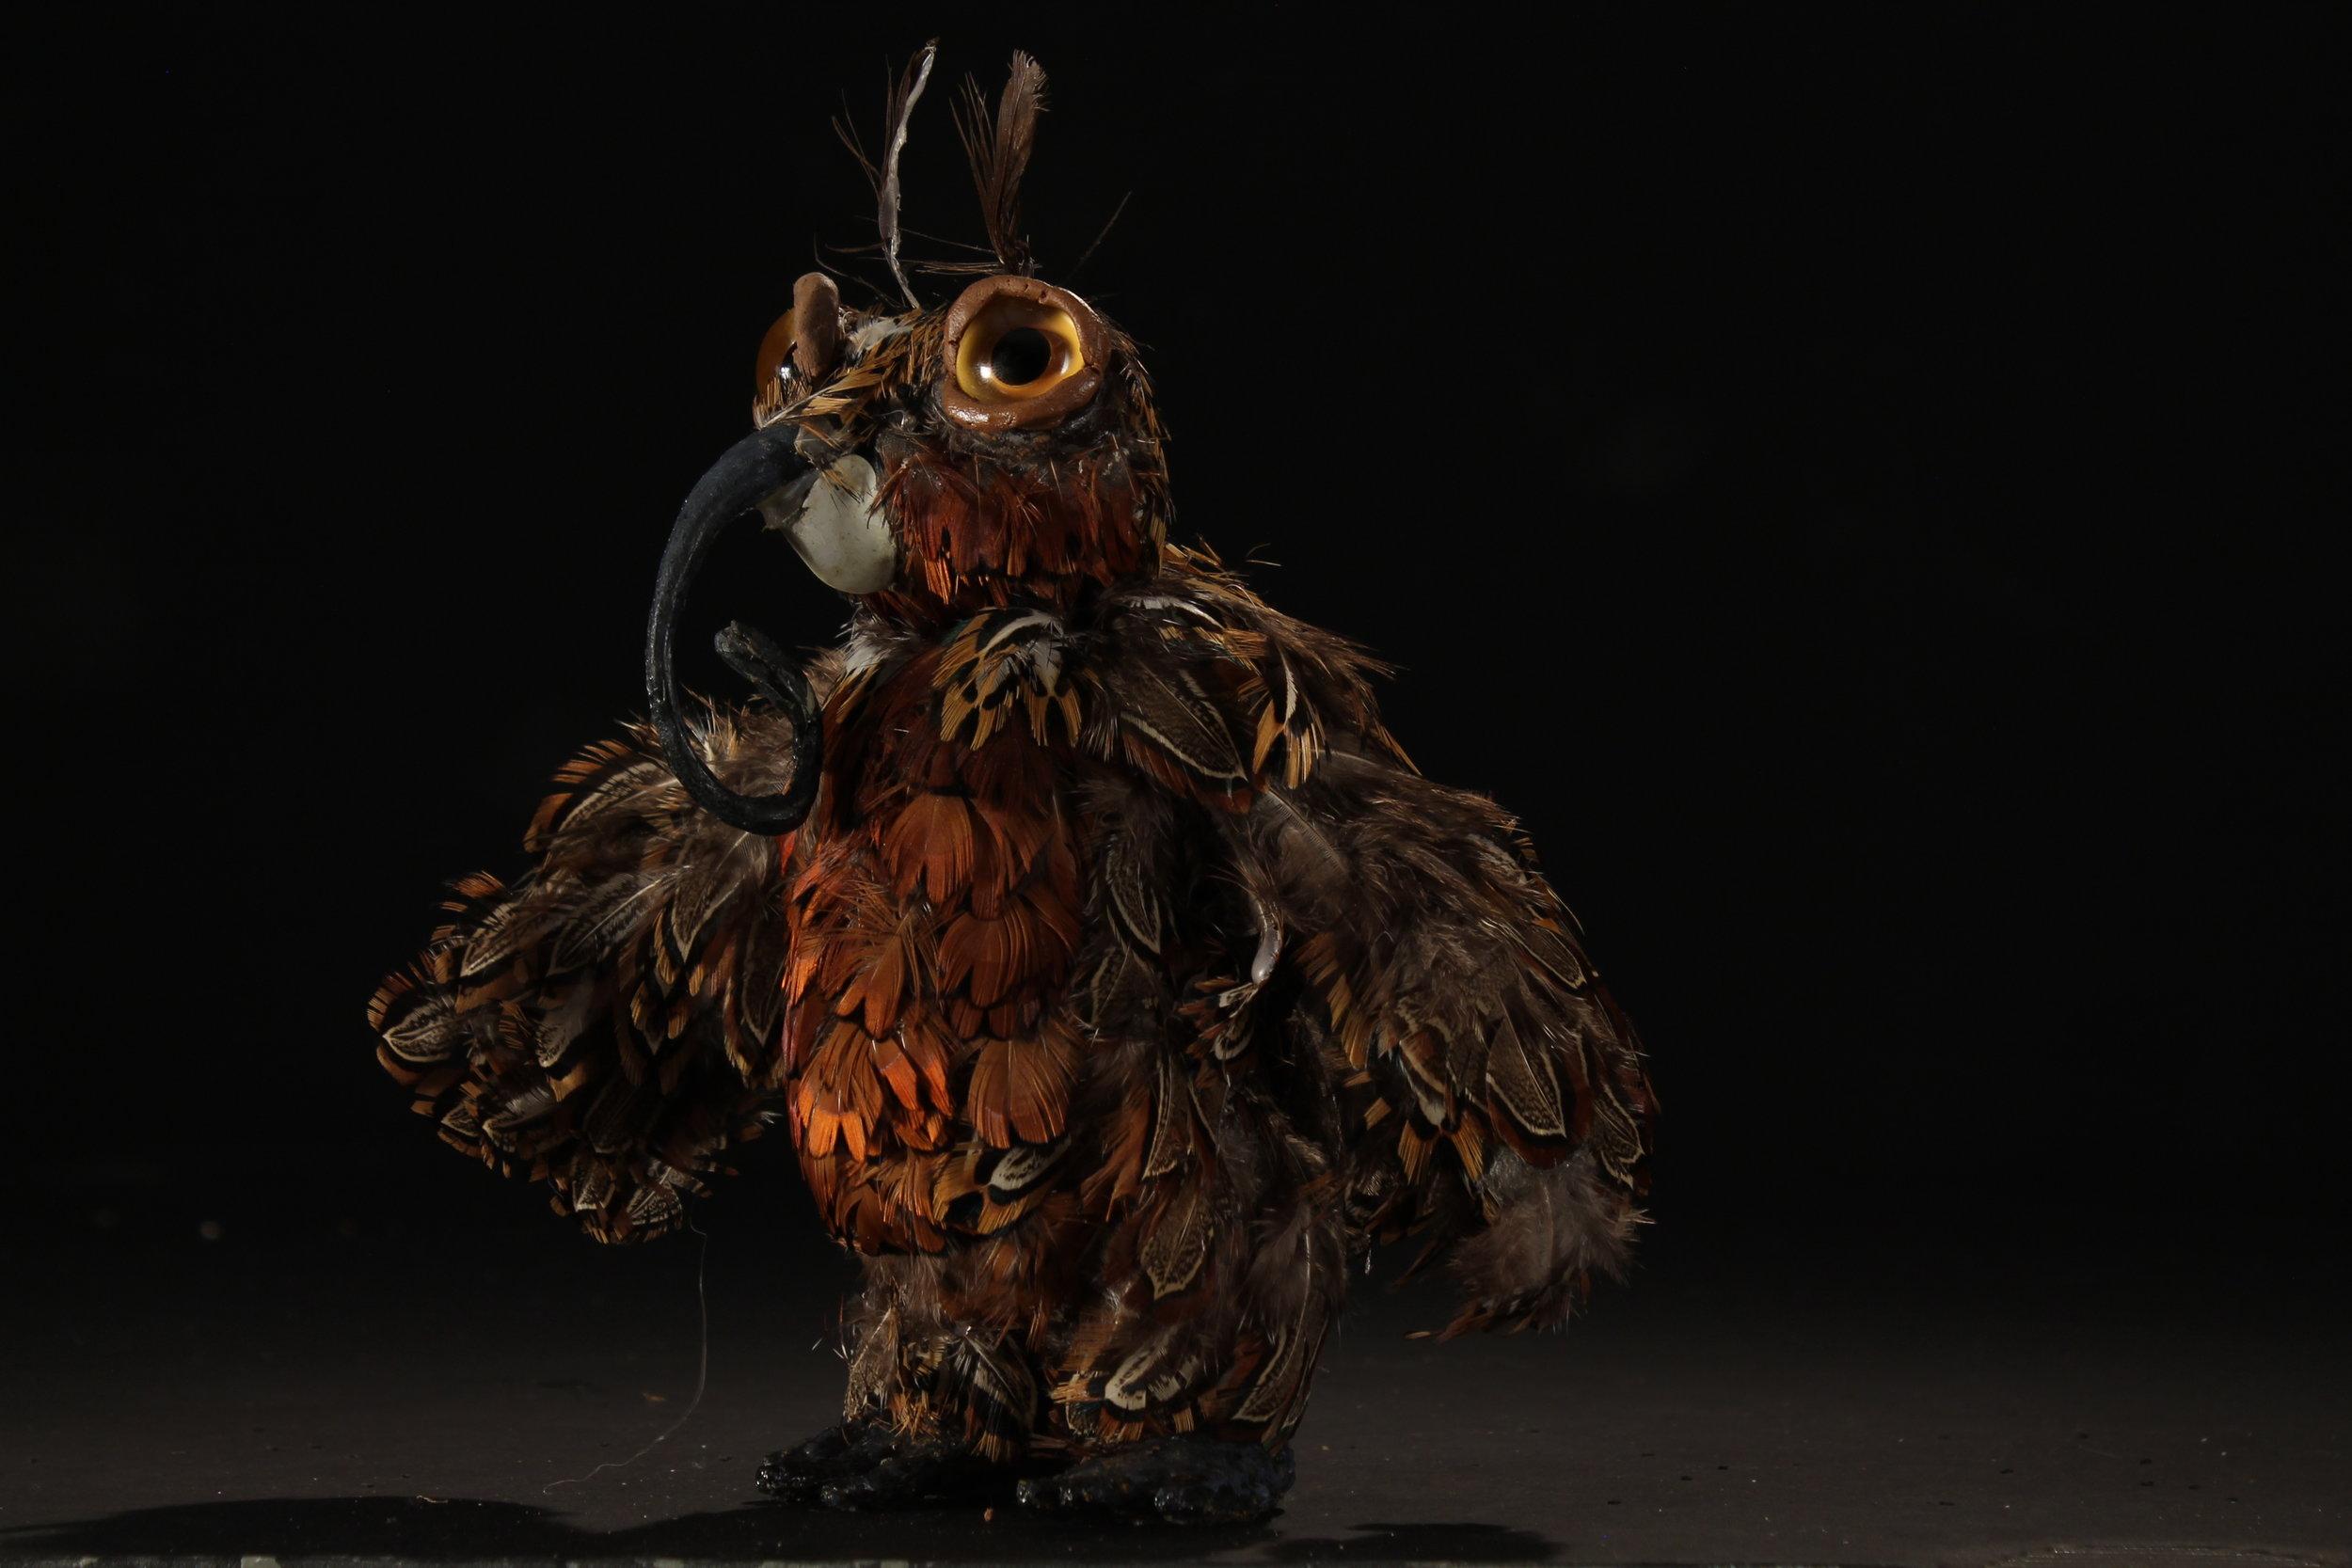 Moth Owl - Side